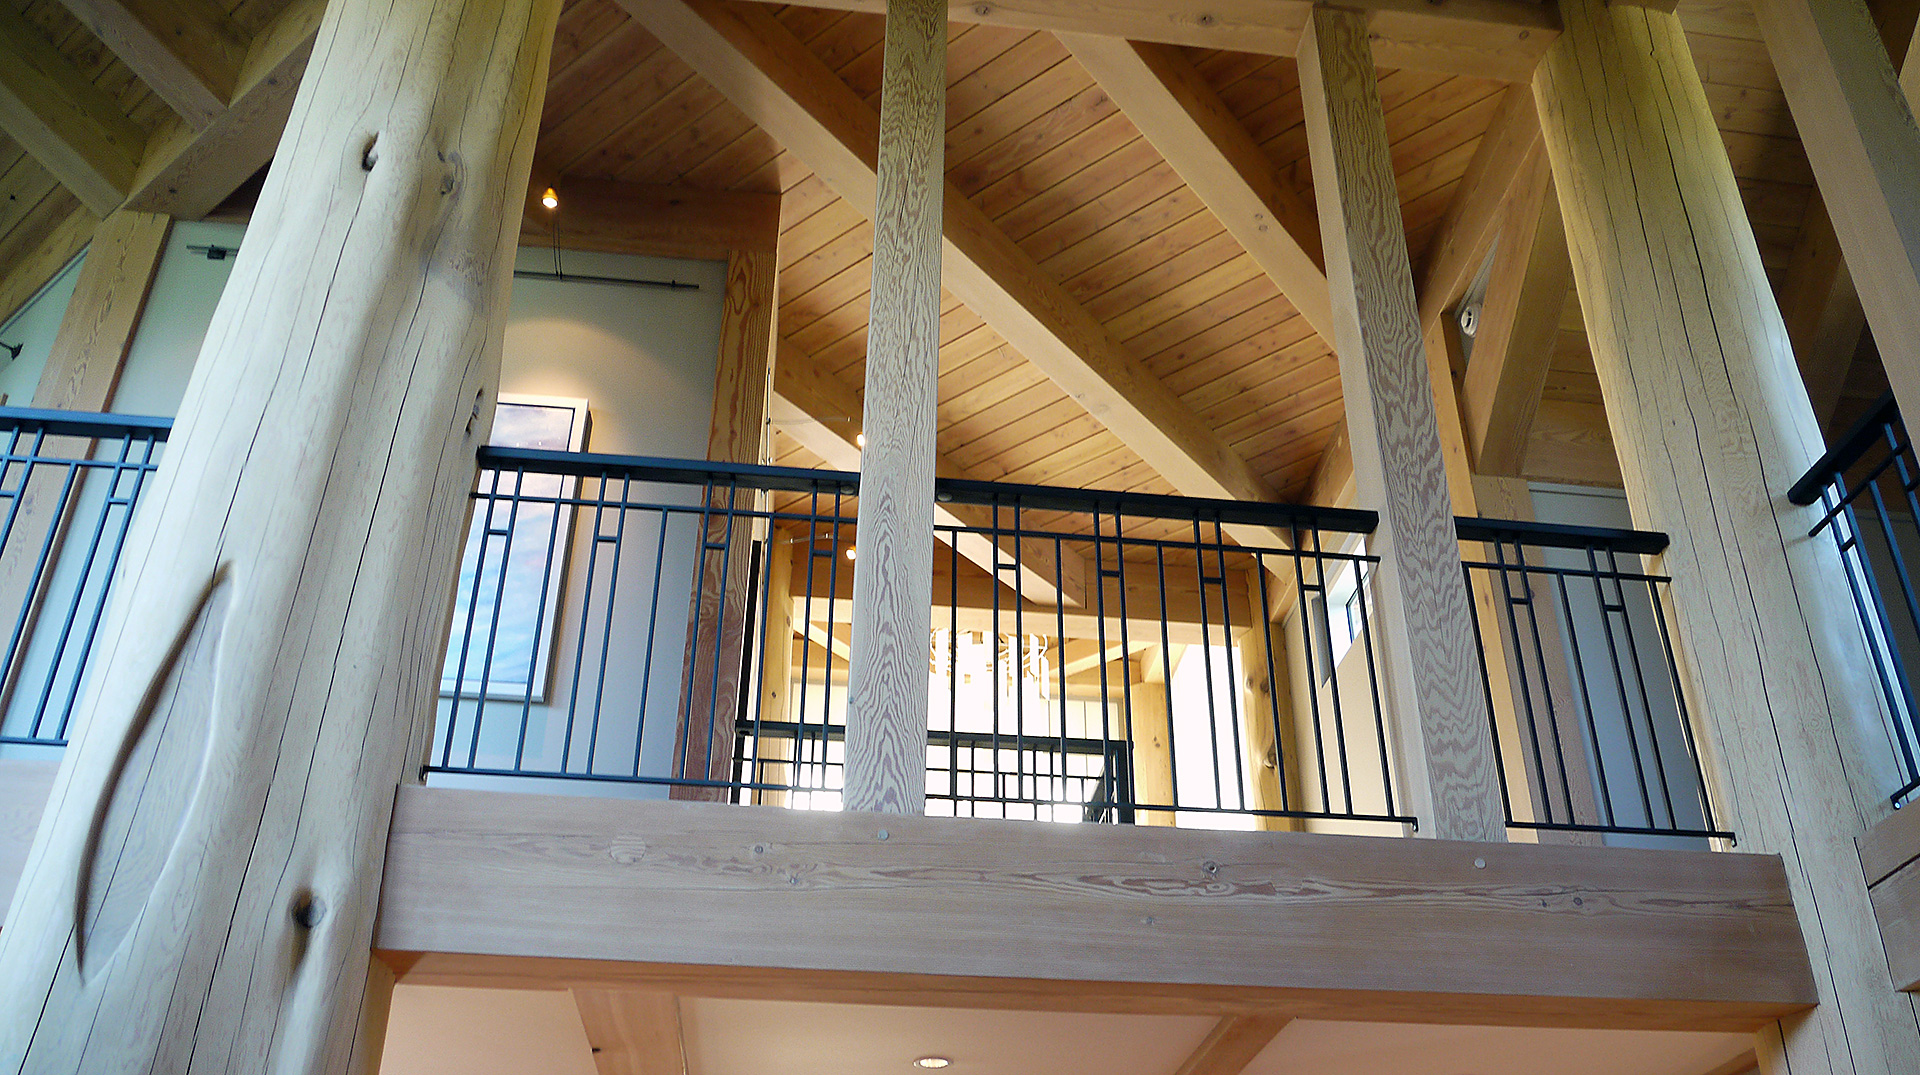 beautiful wood timbers